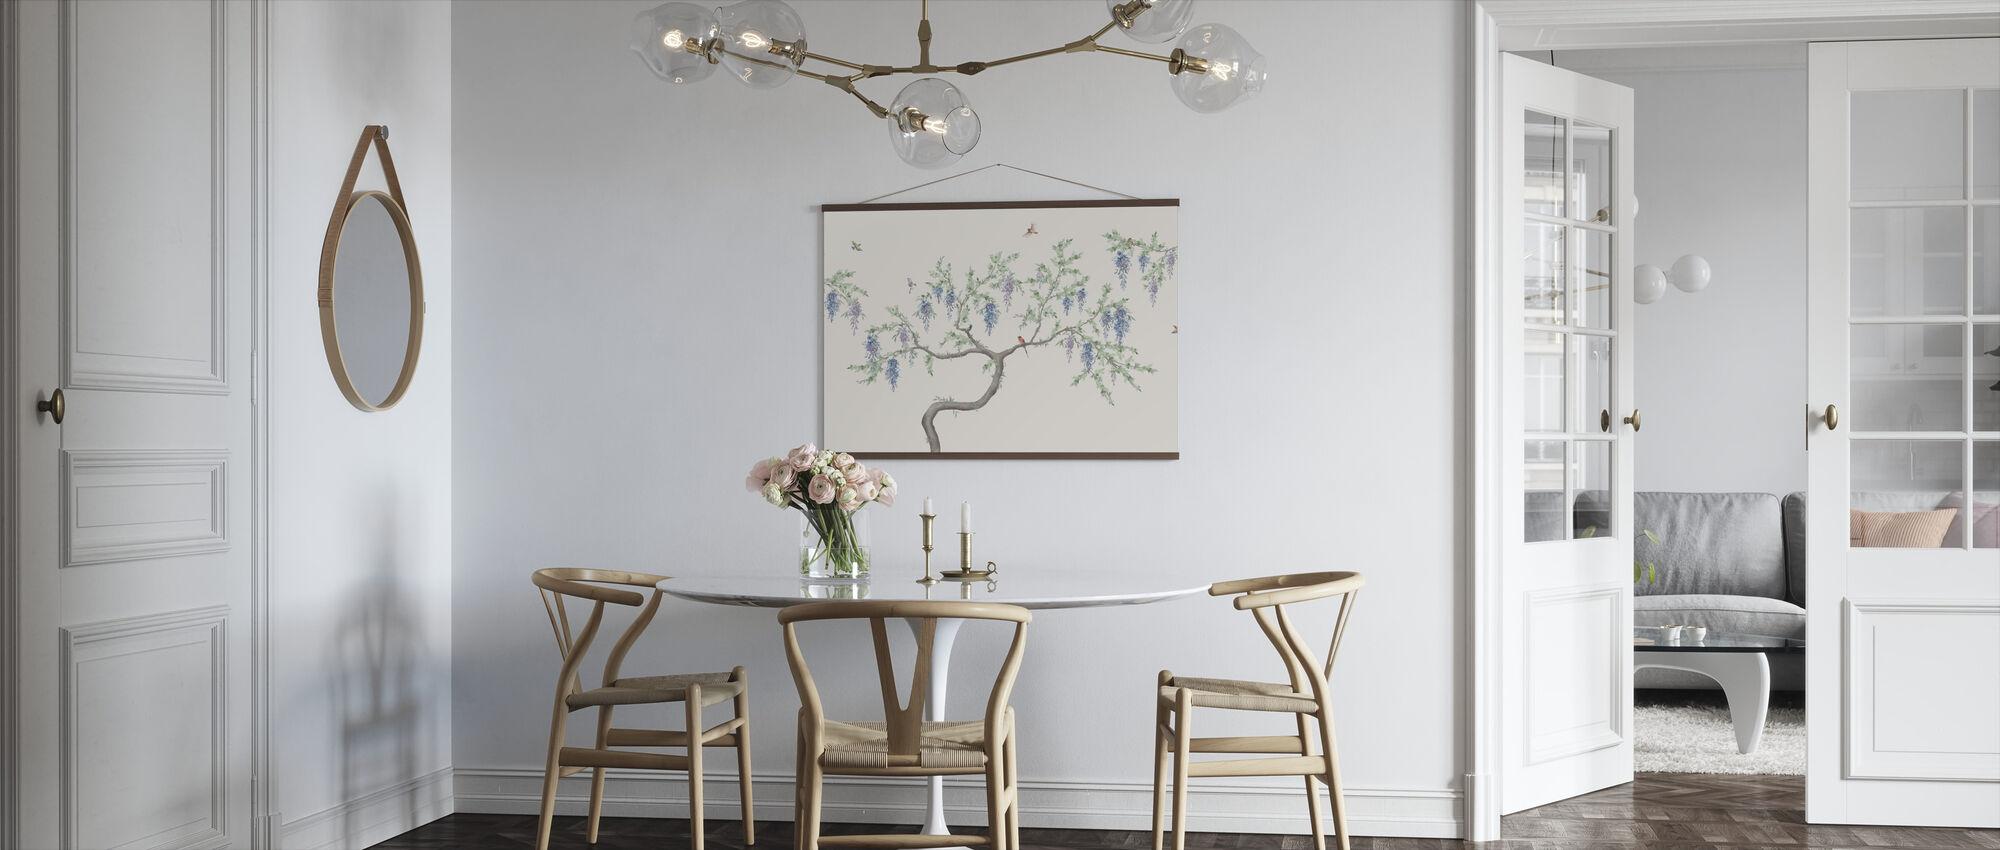 Ineffable Tree - Natur - Poster - Kitchen